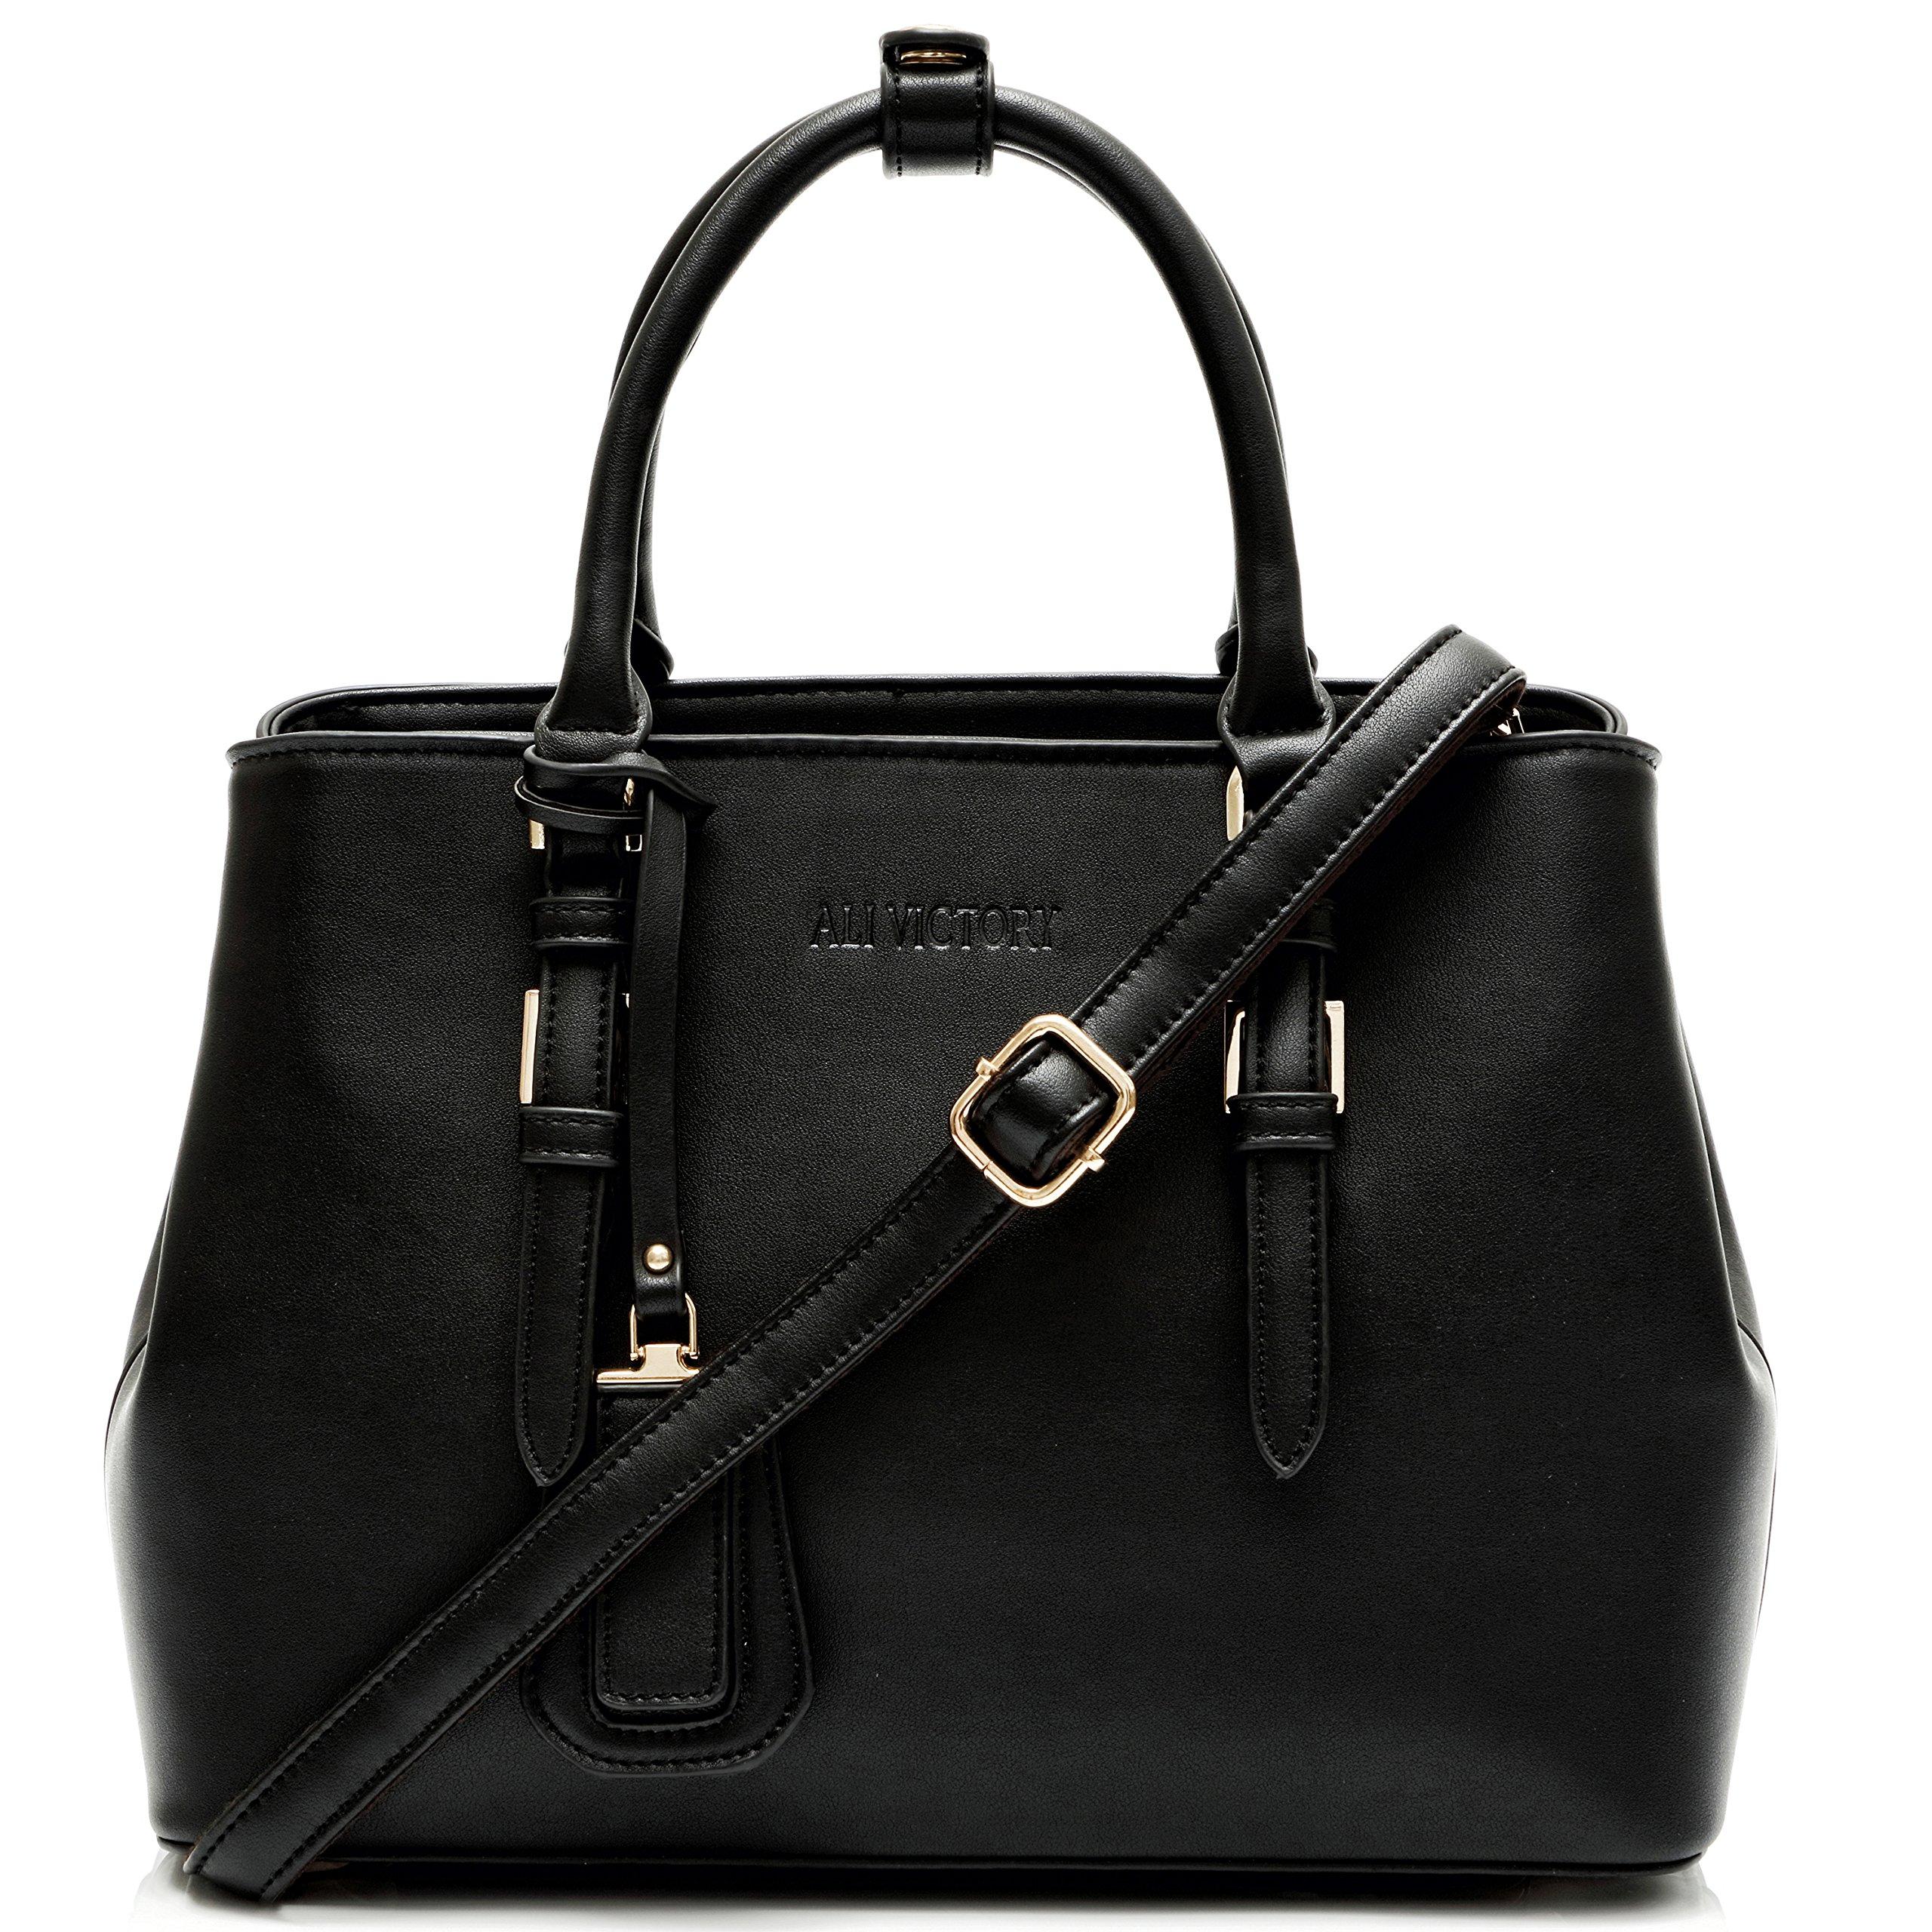 Ali Victory Classy Top Handle Satchel Handbags for Women (Black)